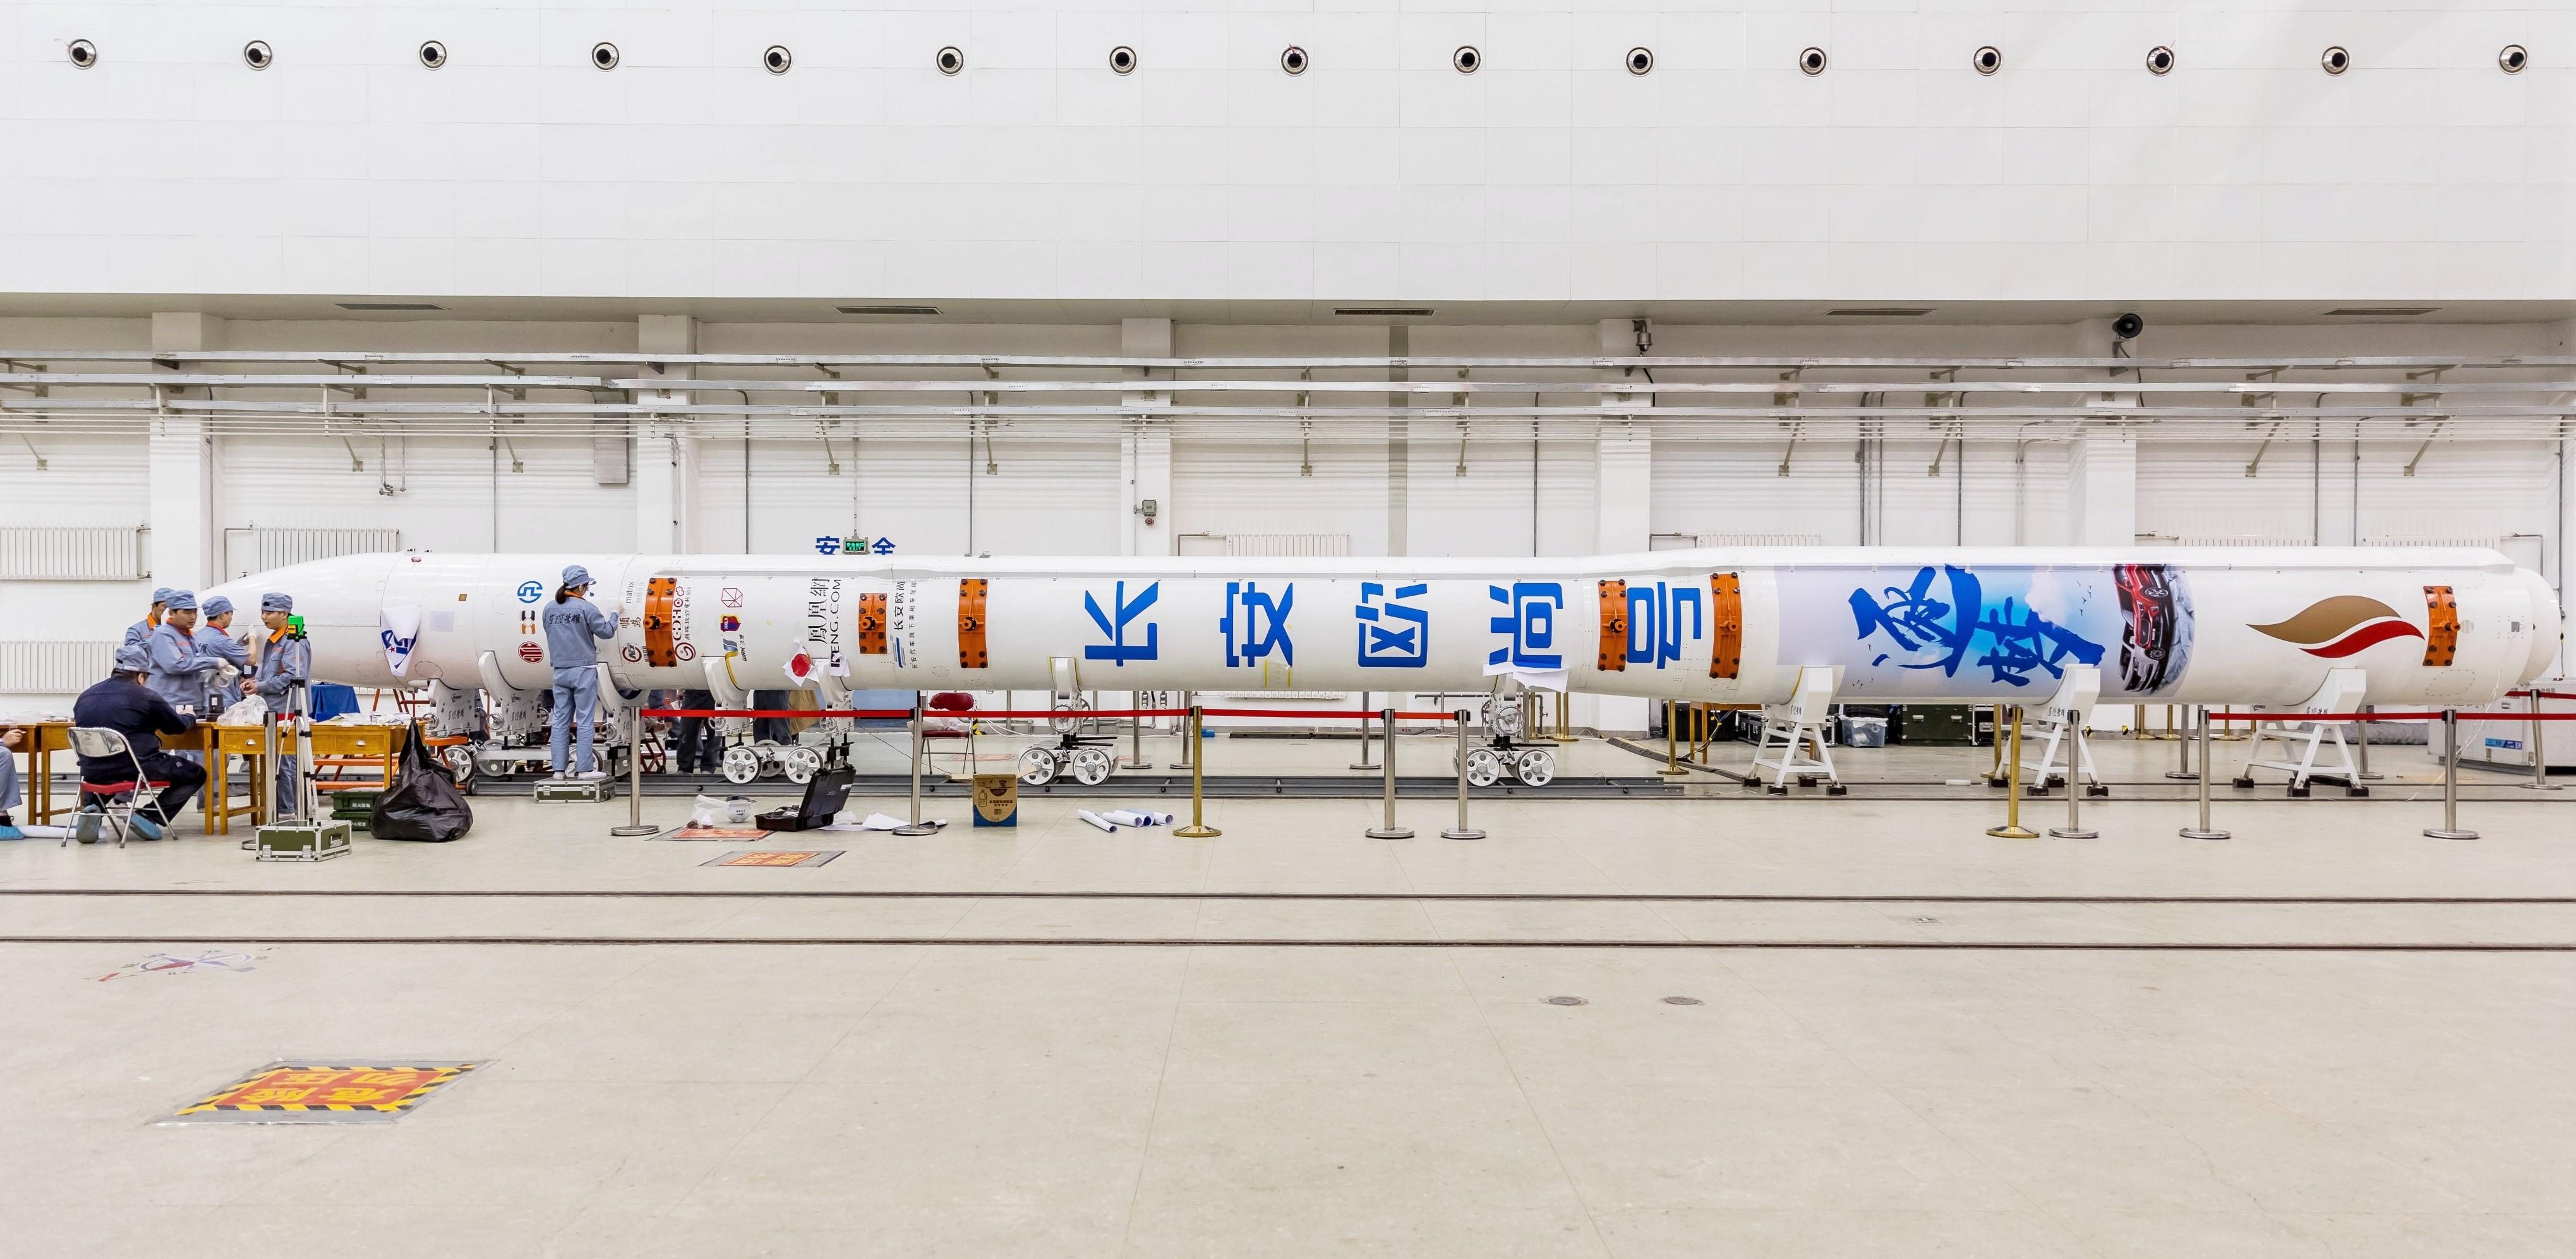 Hyperbola 1 orbital launch success 072519 (iSpace) prelaunch 4